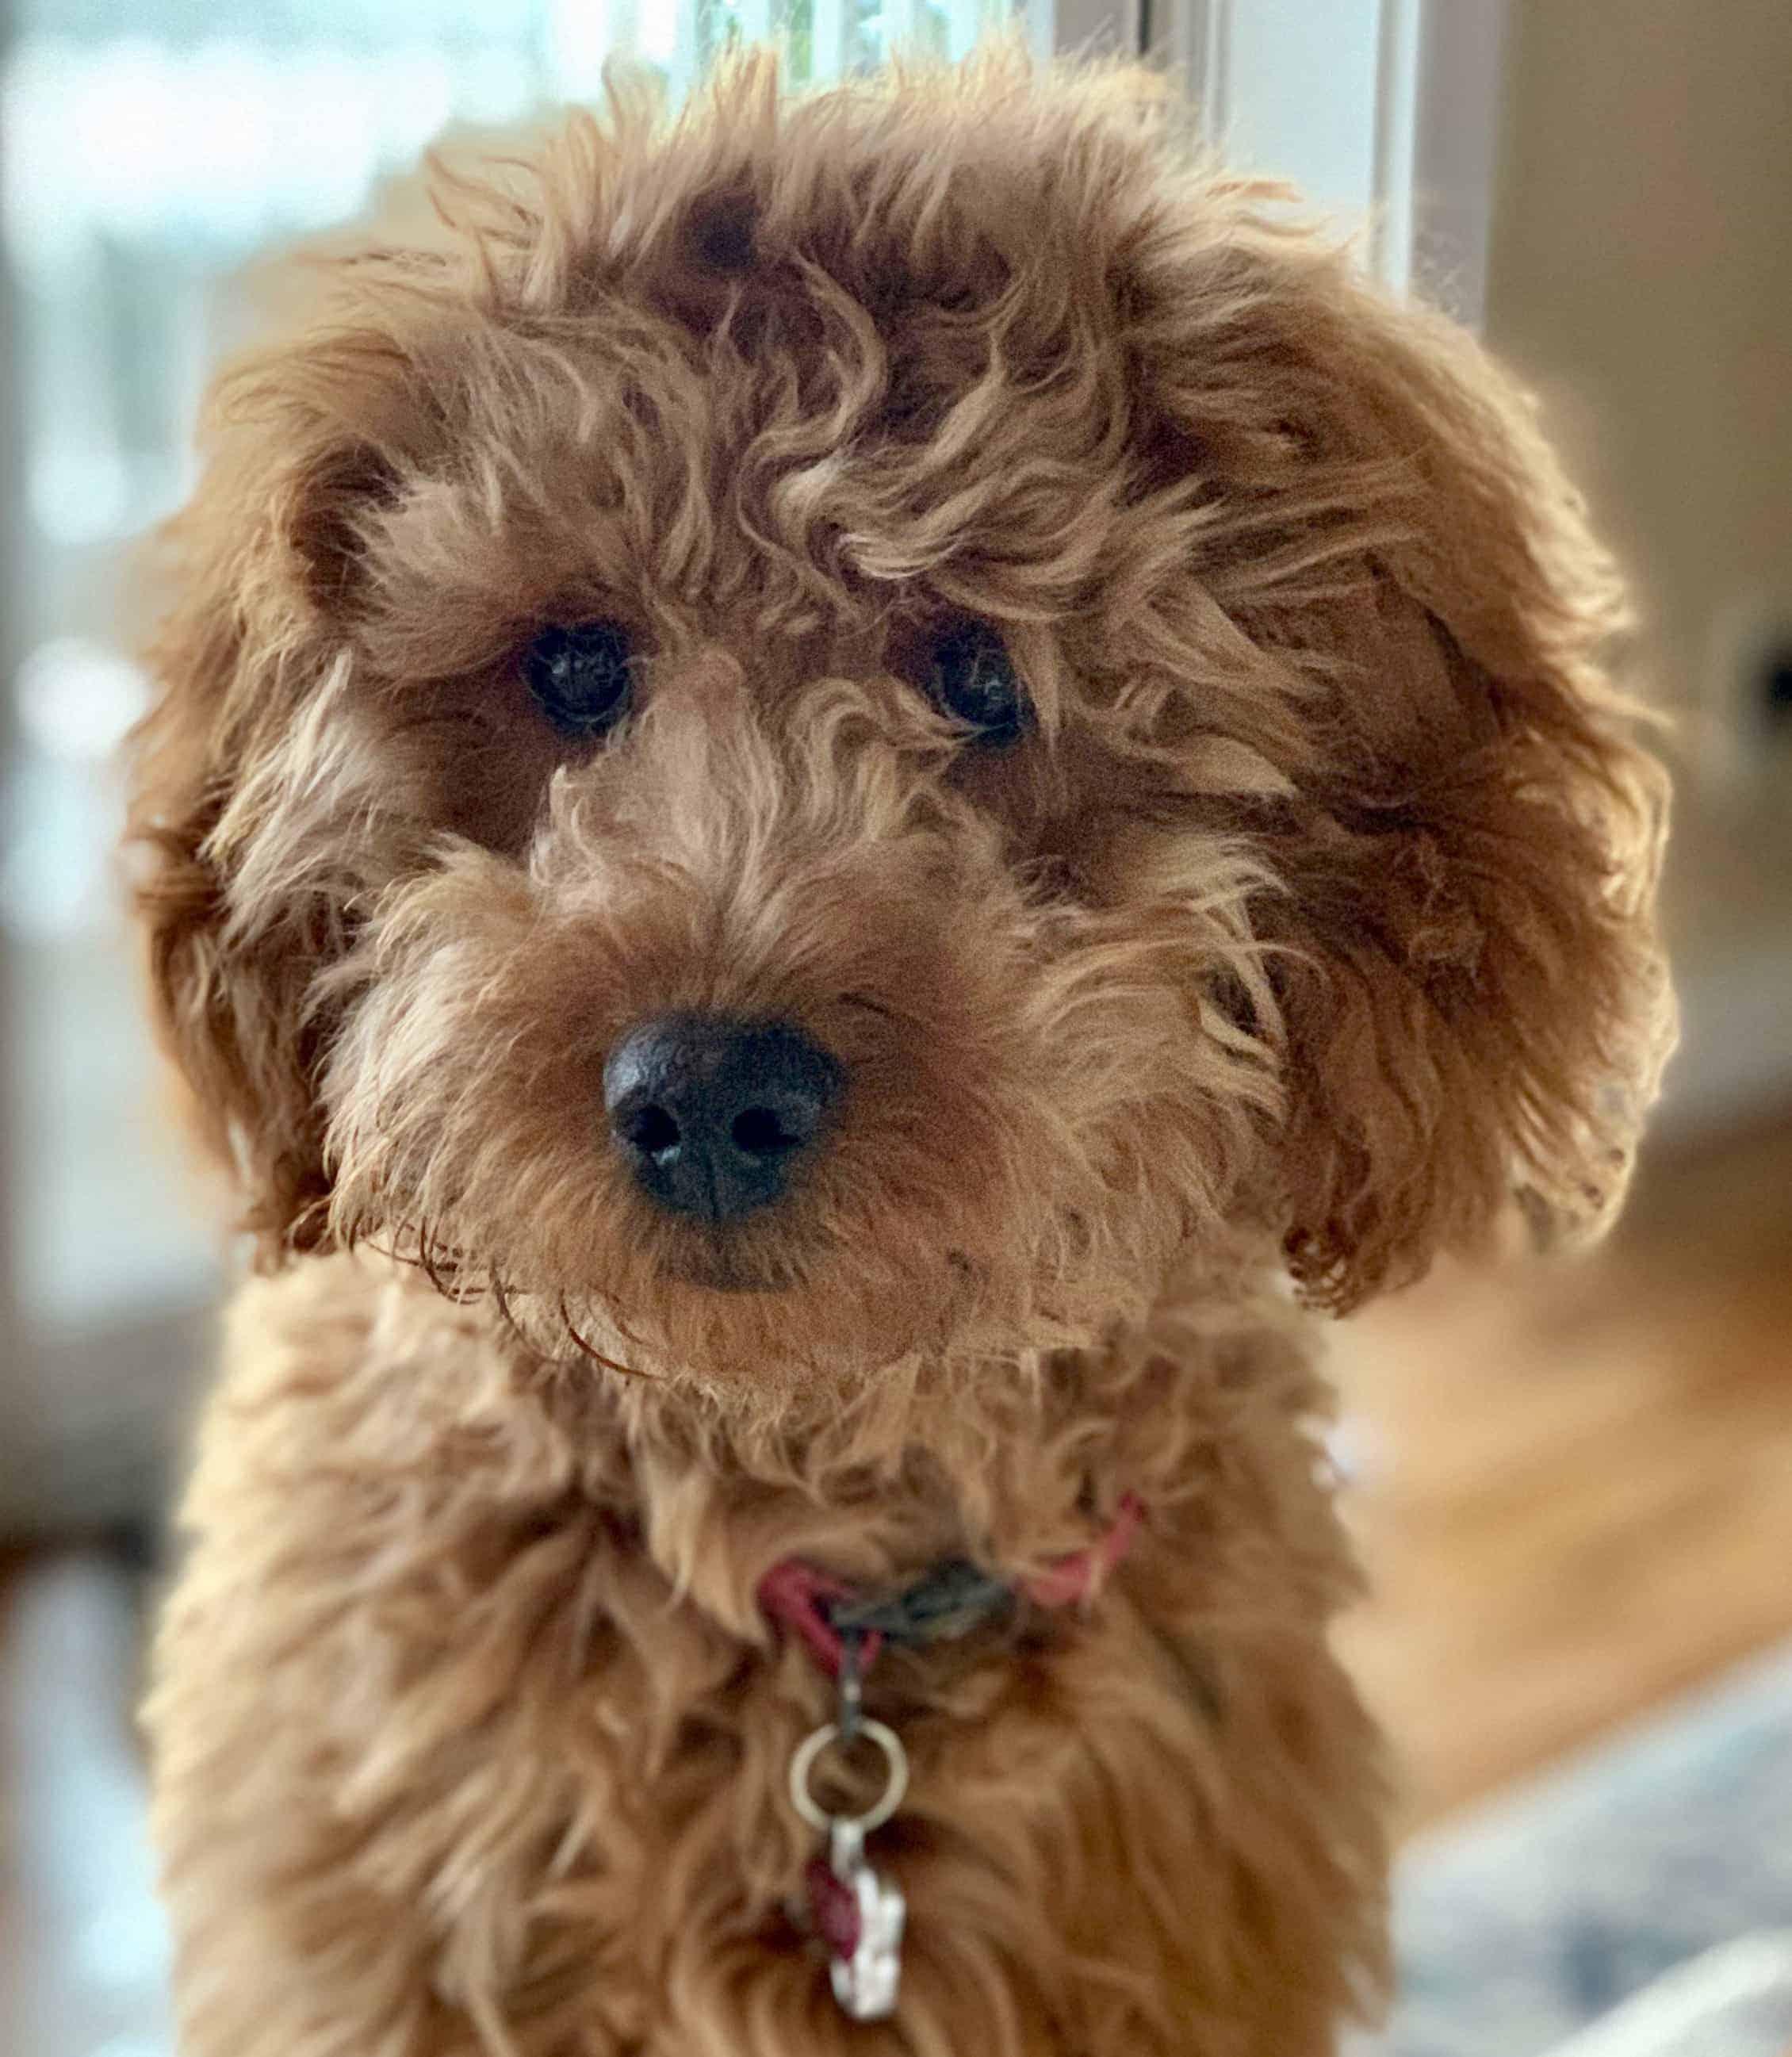 A Goldendoodle named Ruby